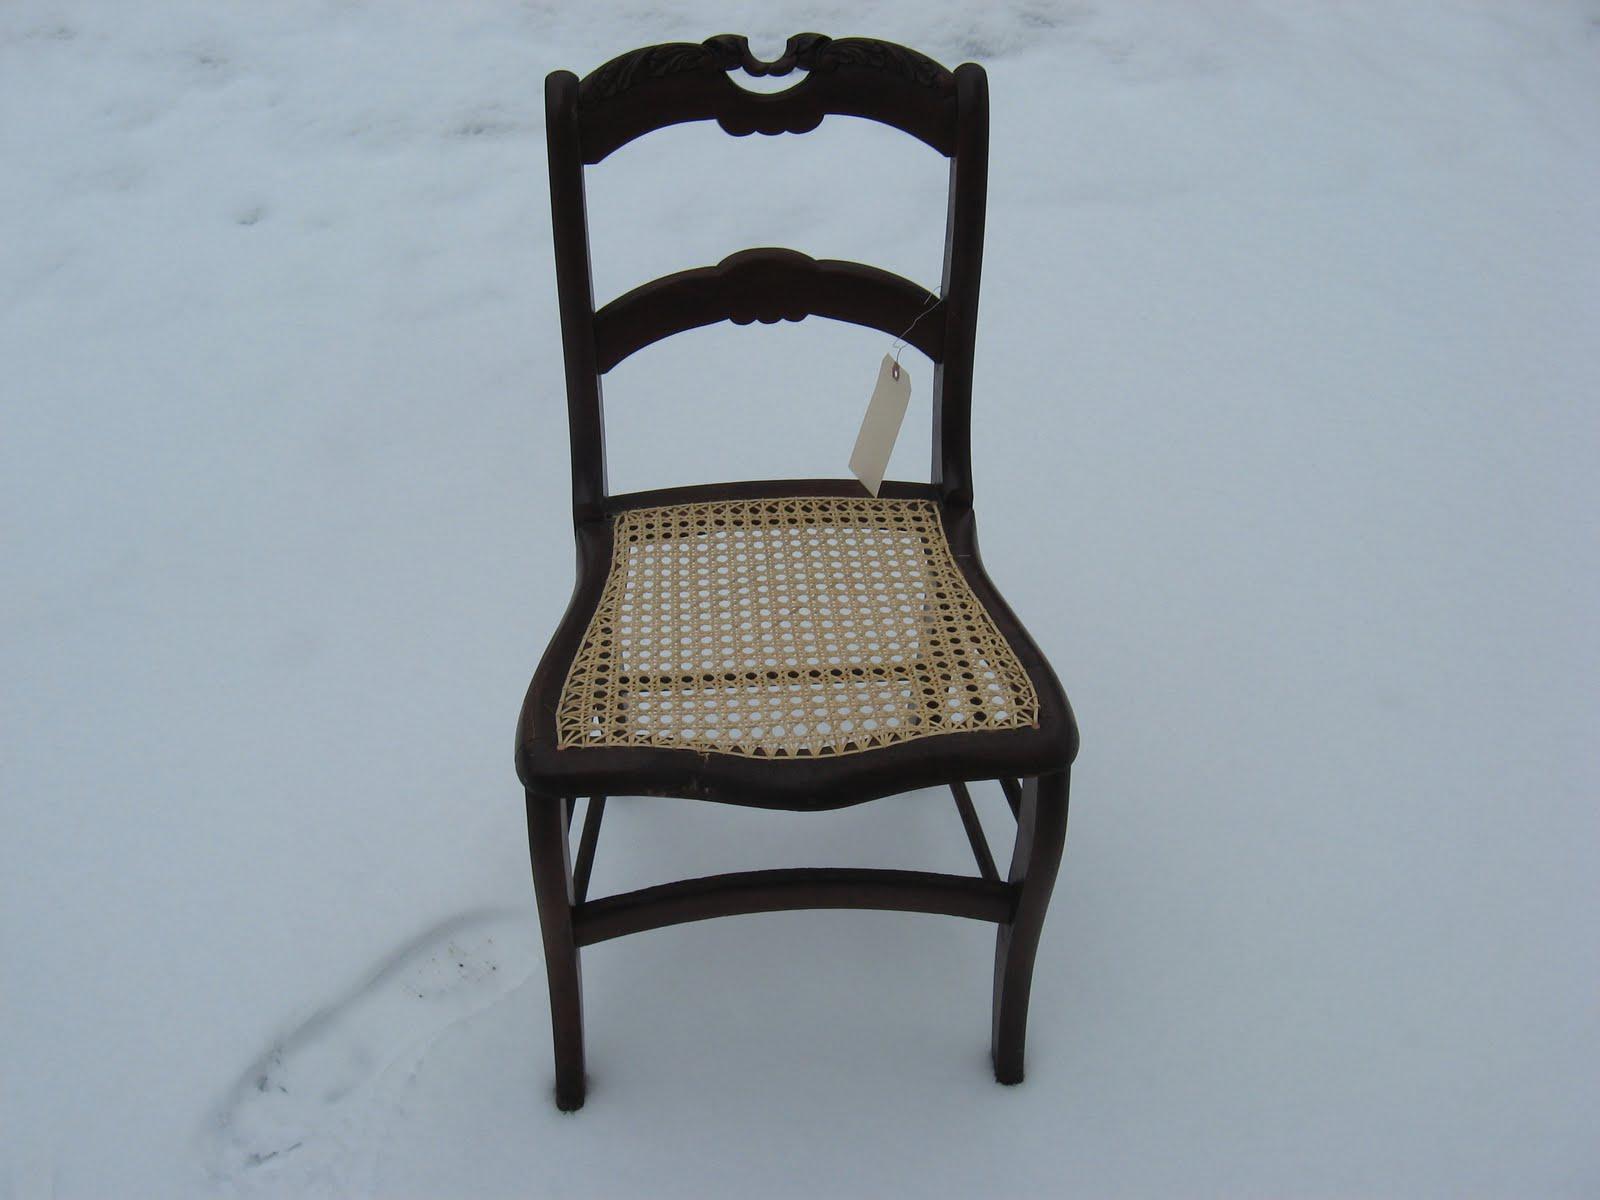 Maine Antique Chair Repair